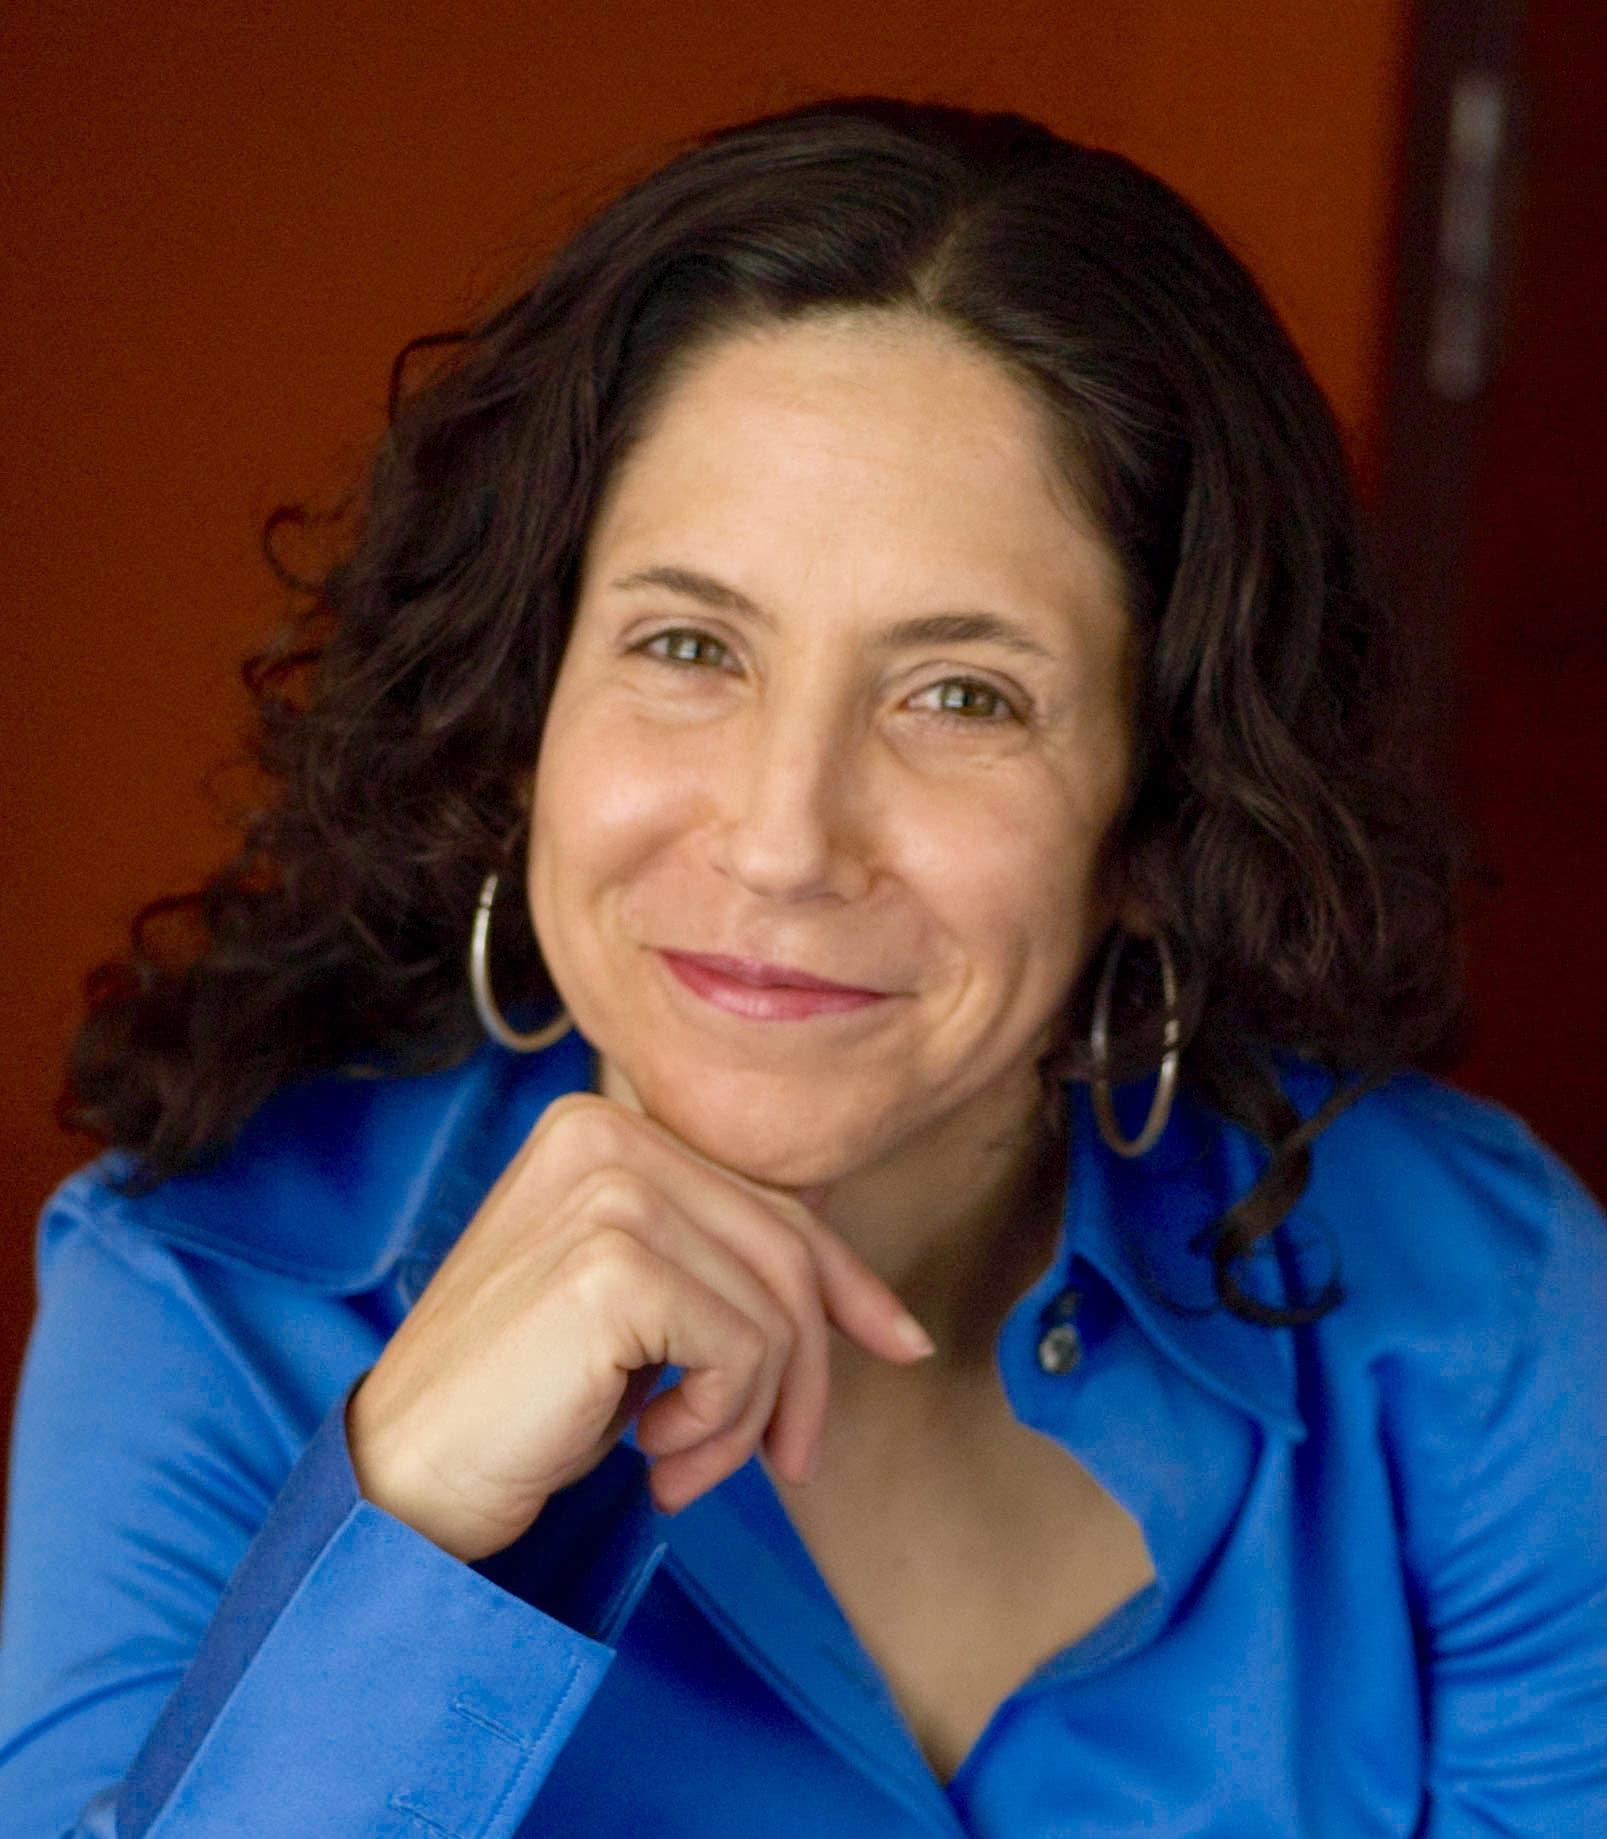 Vivian Zayas, associate professor of psychology